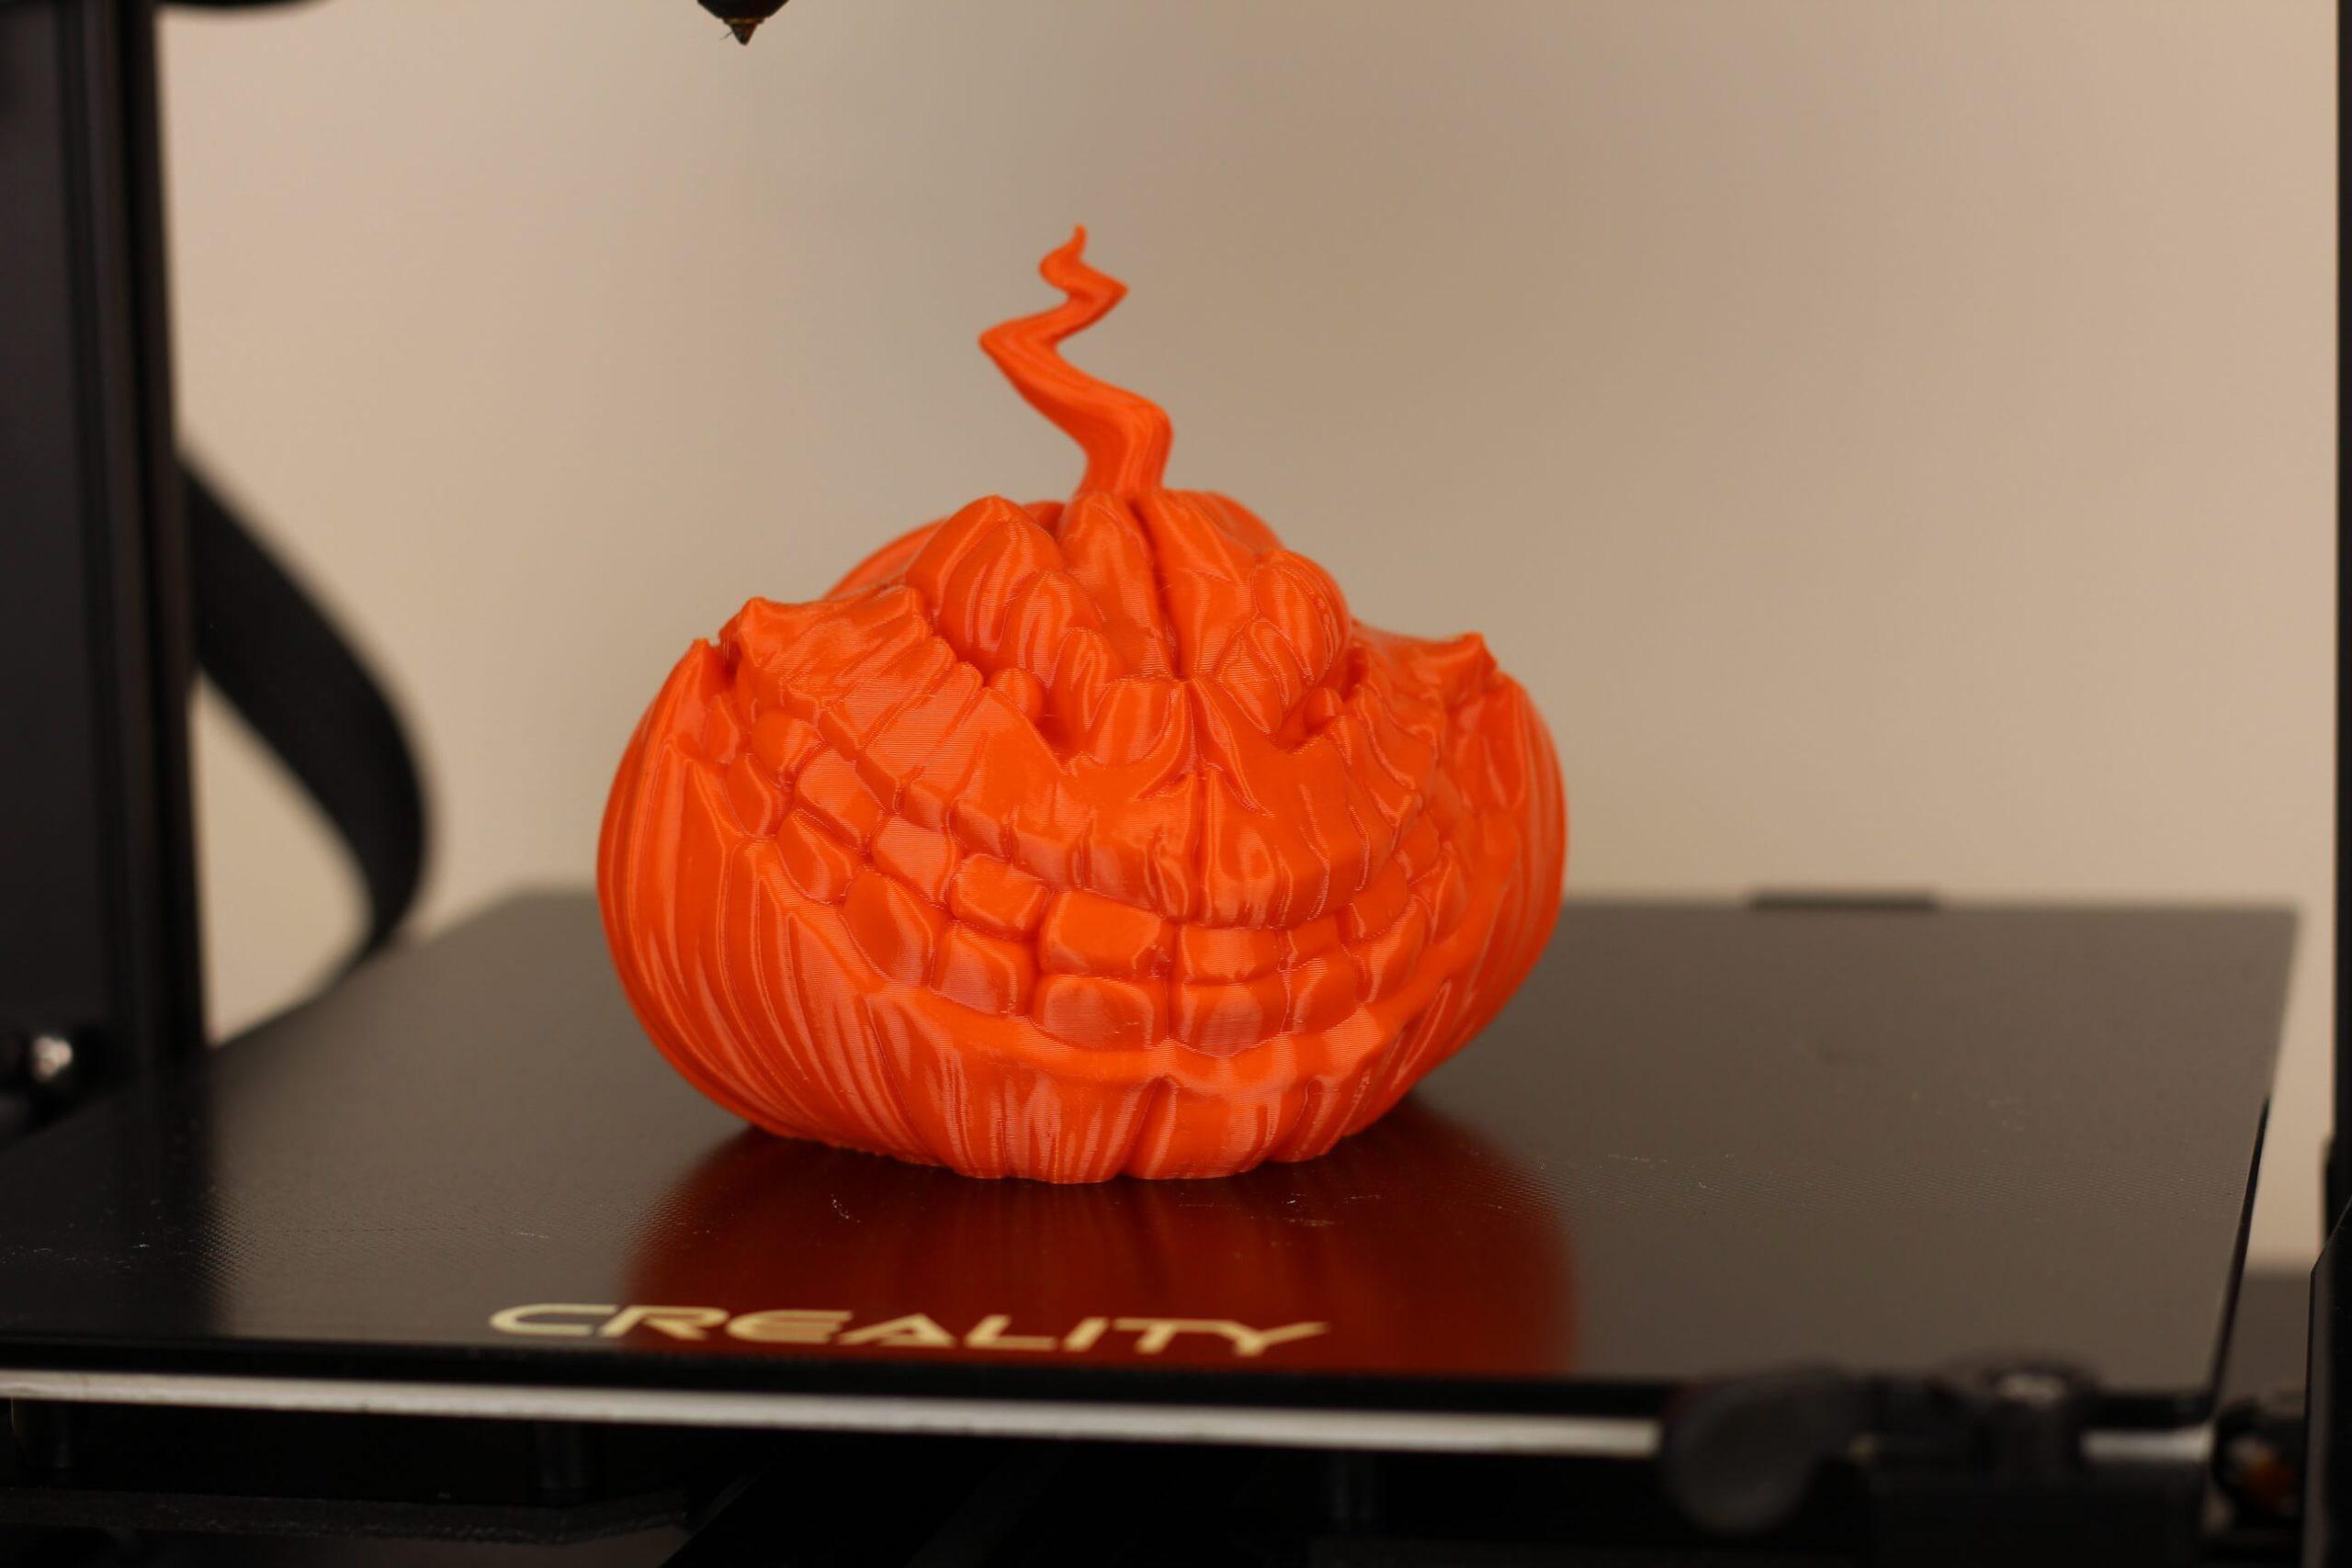 Grinning-Pumpkin-PETG-print-on-CR-6-SE-3